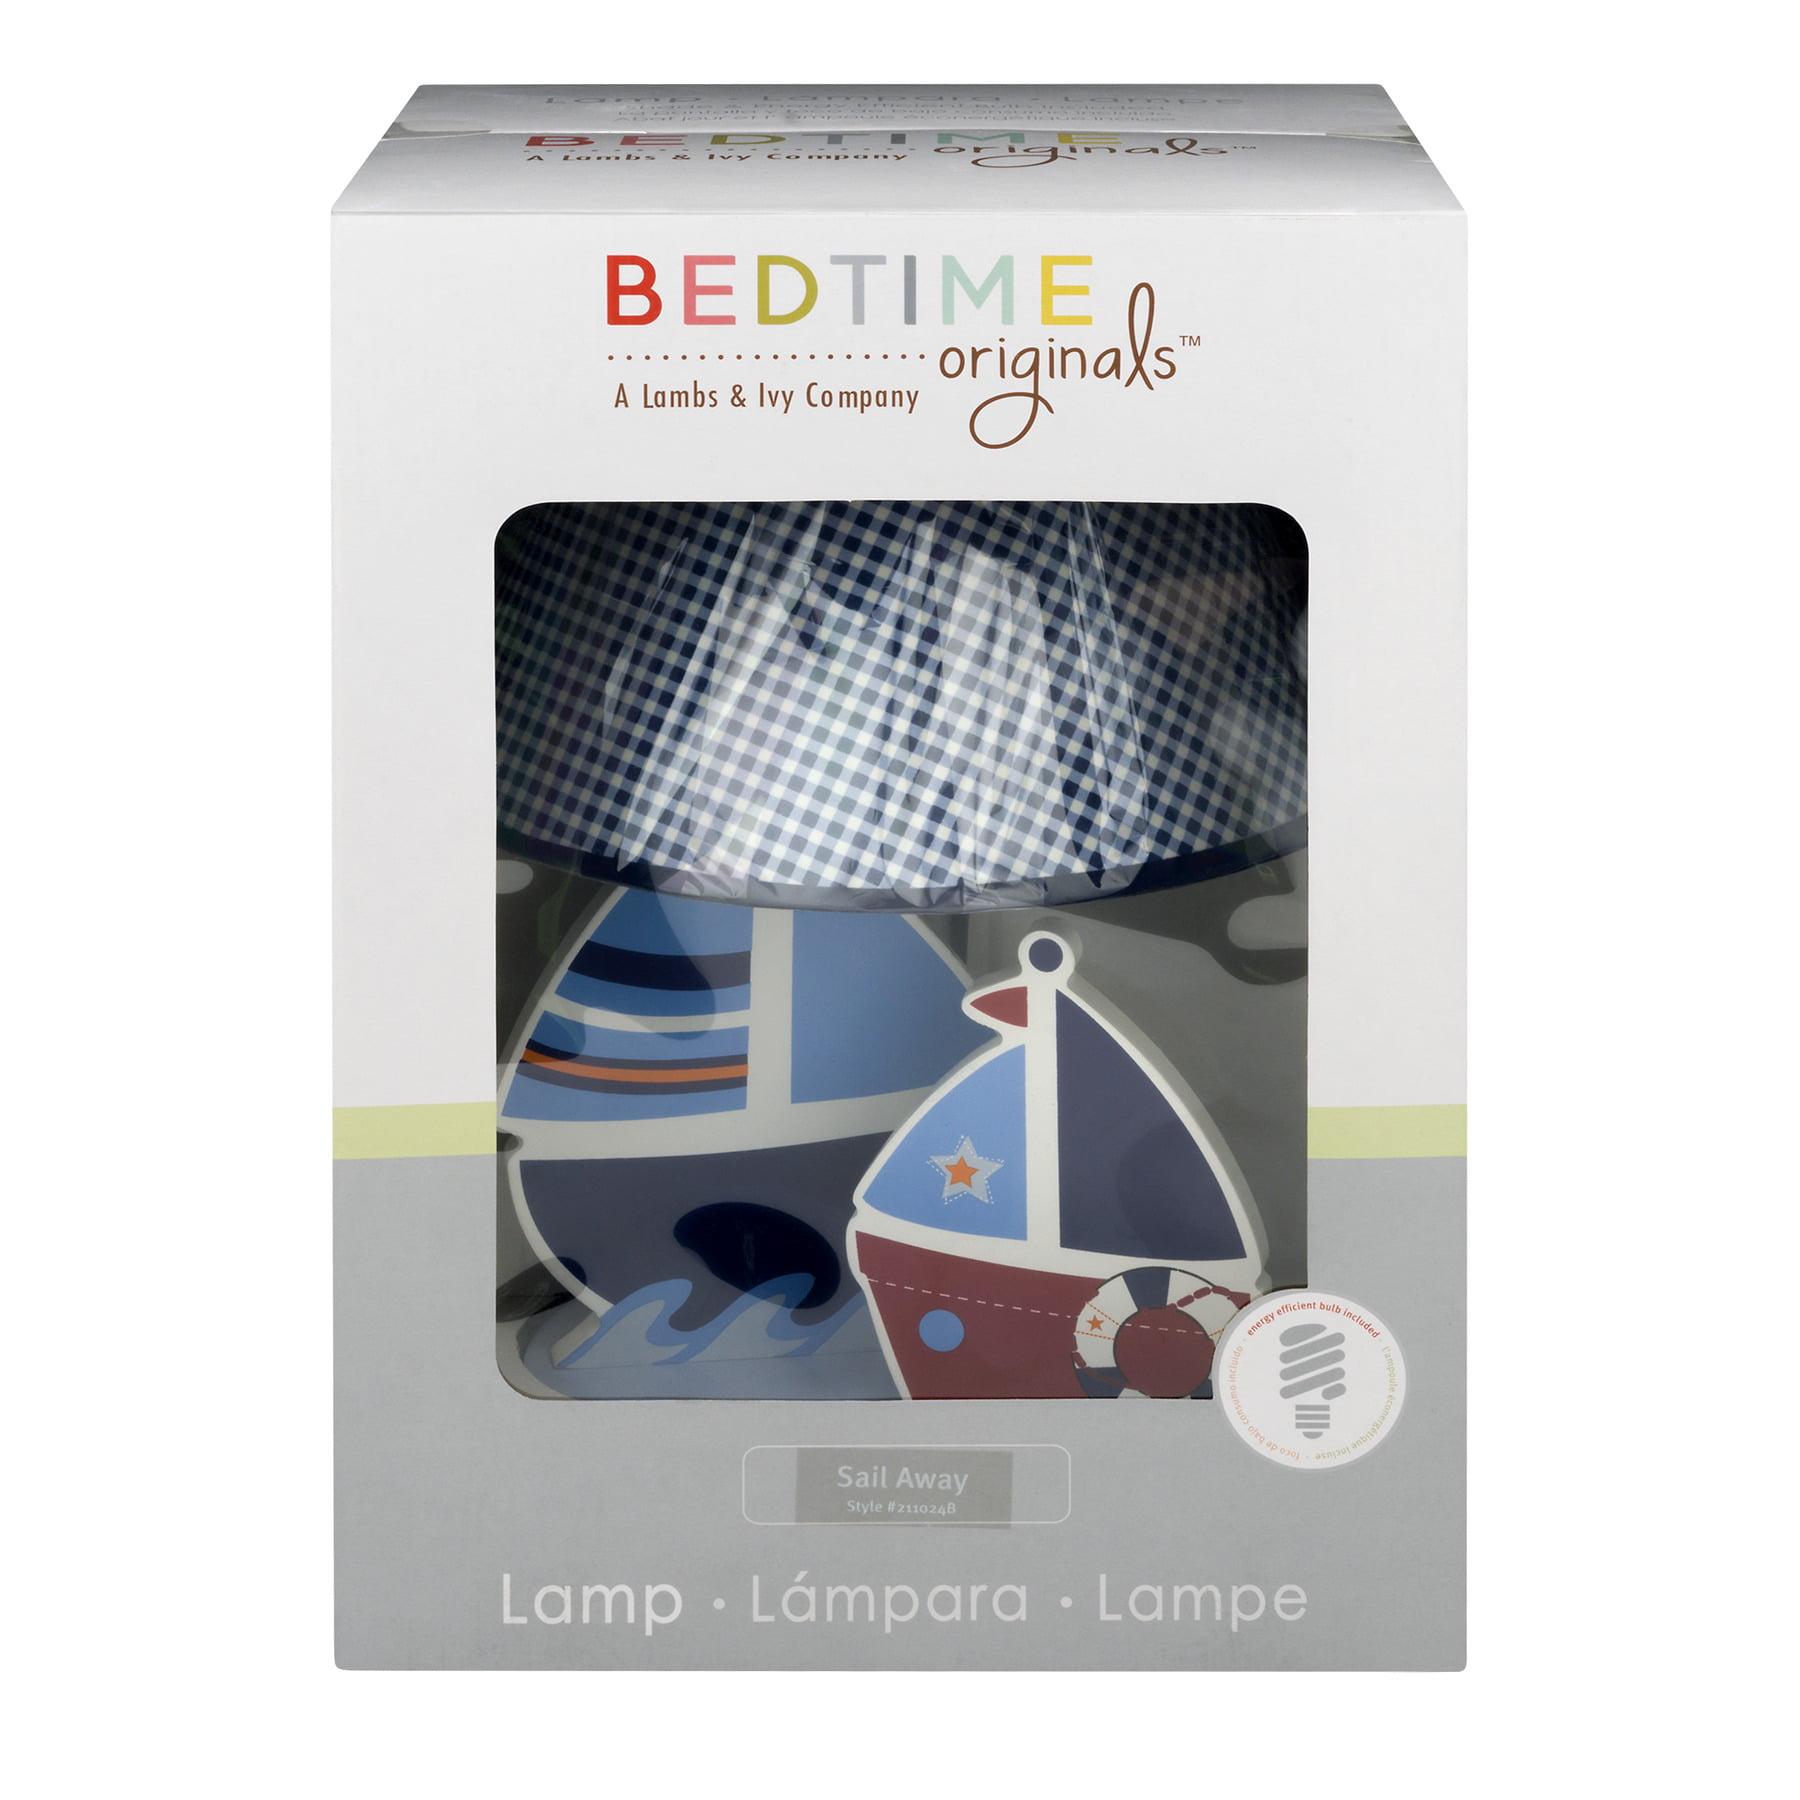 Bedtime Originals Lamp Sail Away -1 CT1.0 CT by Lambs %26 Ivy